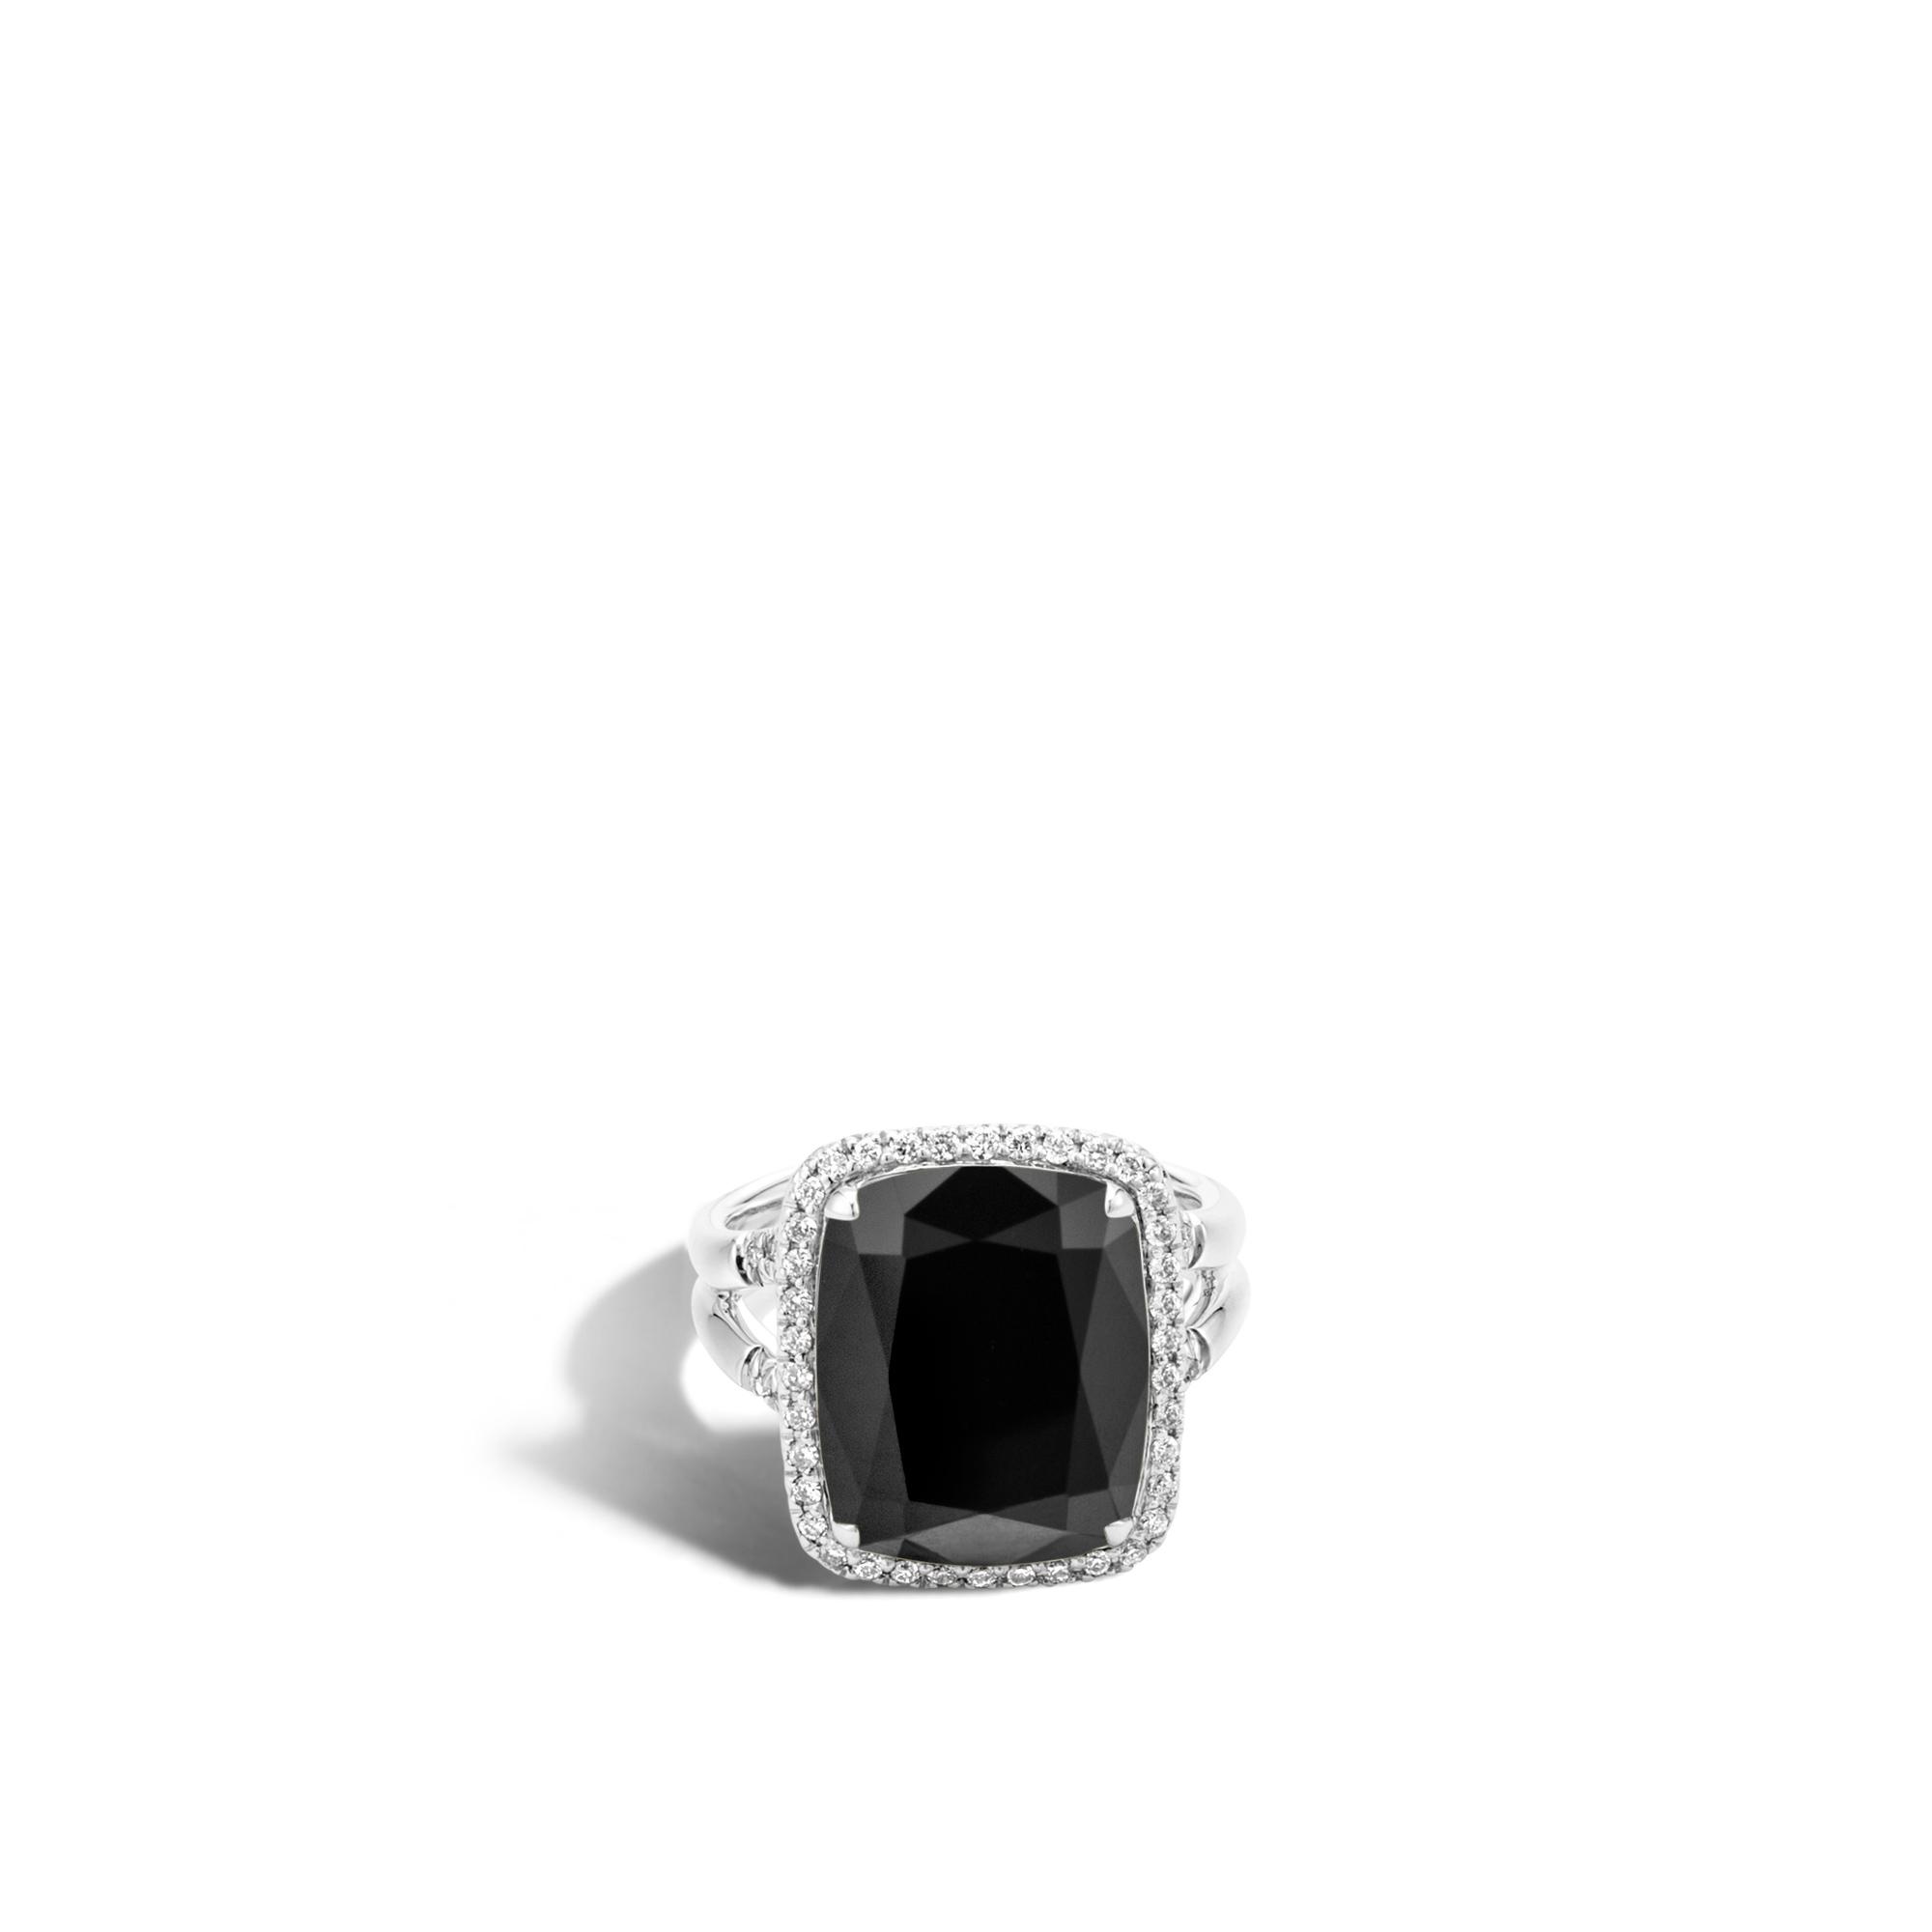 Classic Chain Magic Cut Ring, Silver, 15x12MM Gems, Diamonds, Black Onyx, large